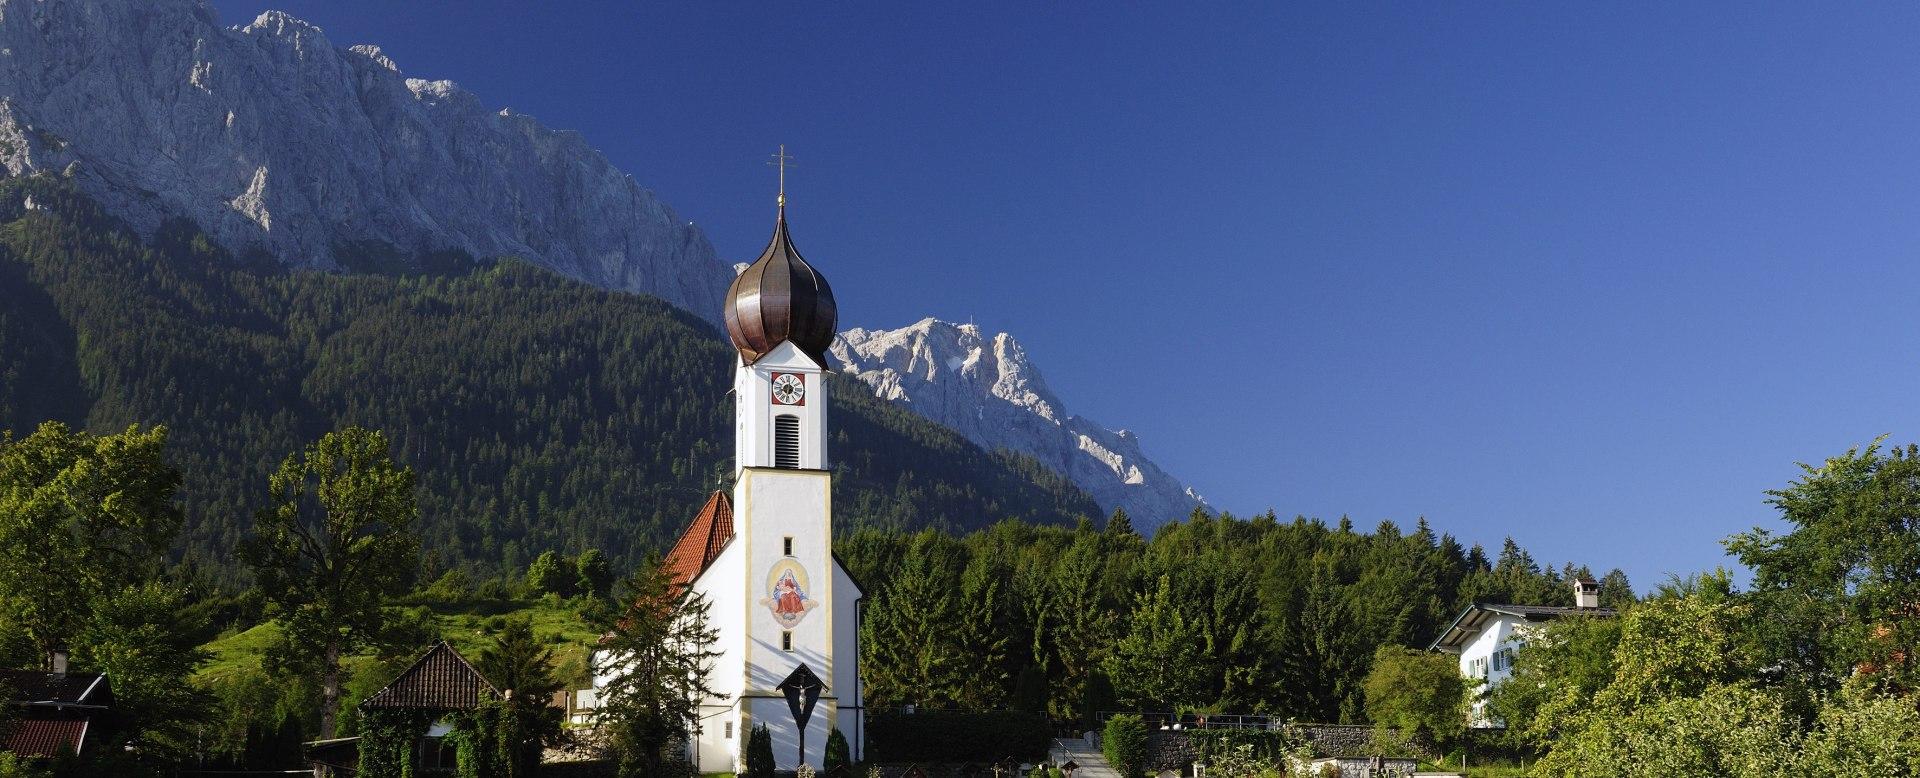 Kirche St. Johannes der Täufer, Grainau mit Bergfriedhof, © Touristinformation Grainau - Foto Ehn